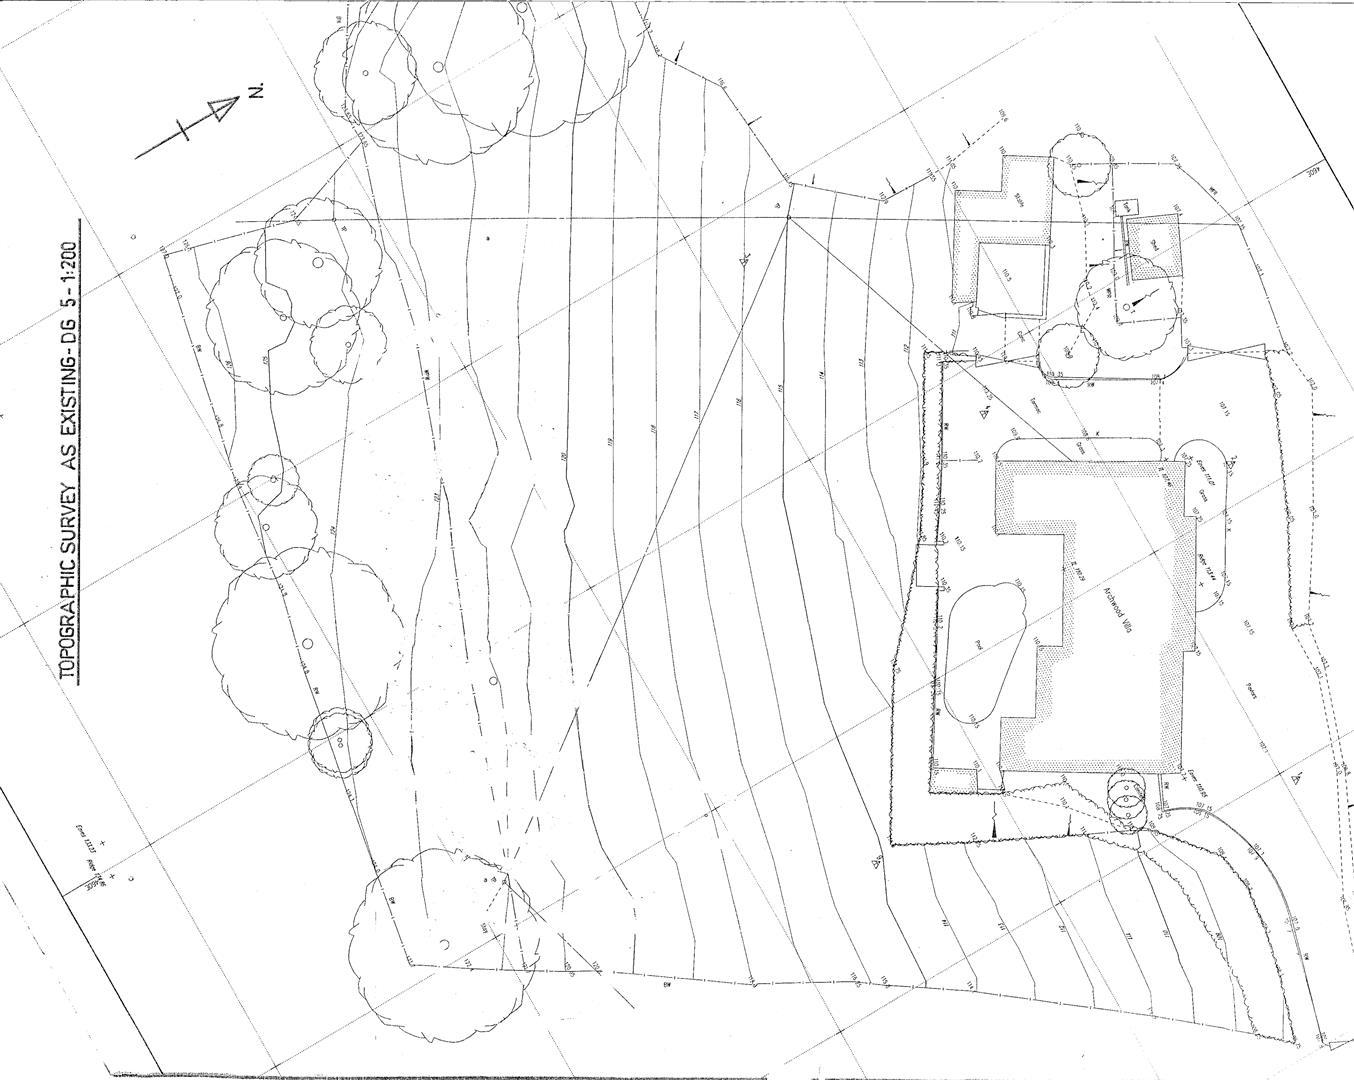 House For Sale In Colwyn Bay